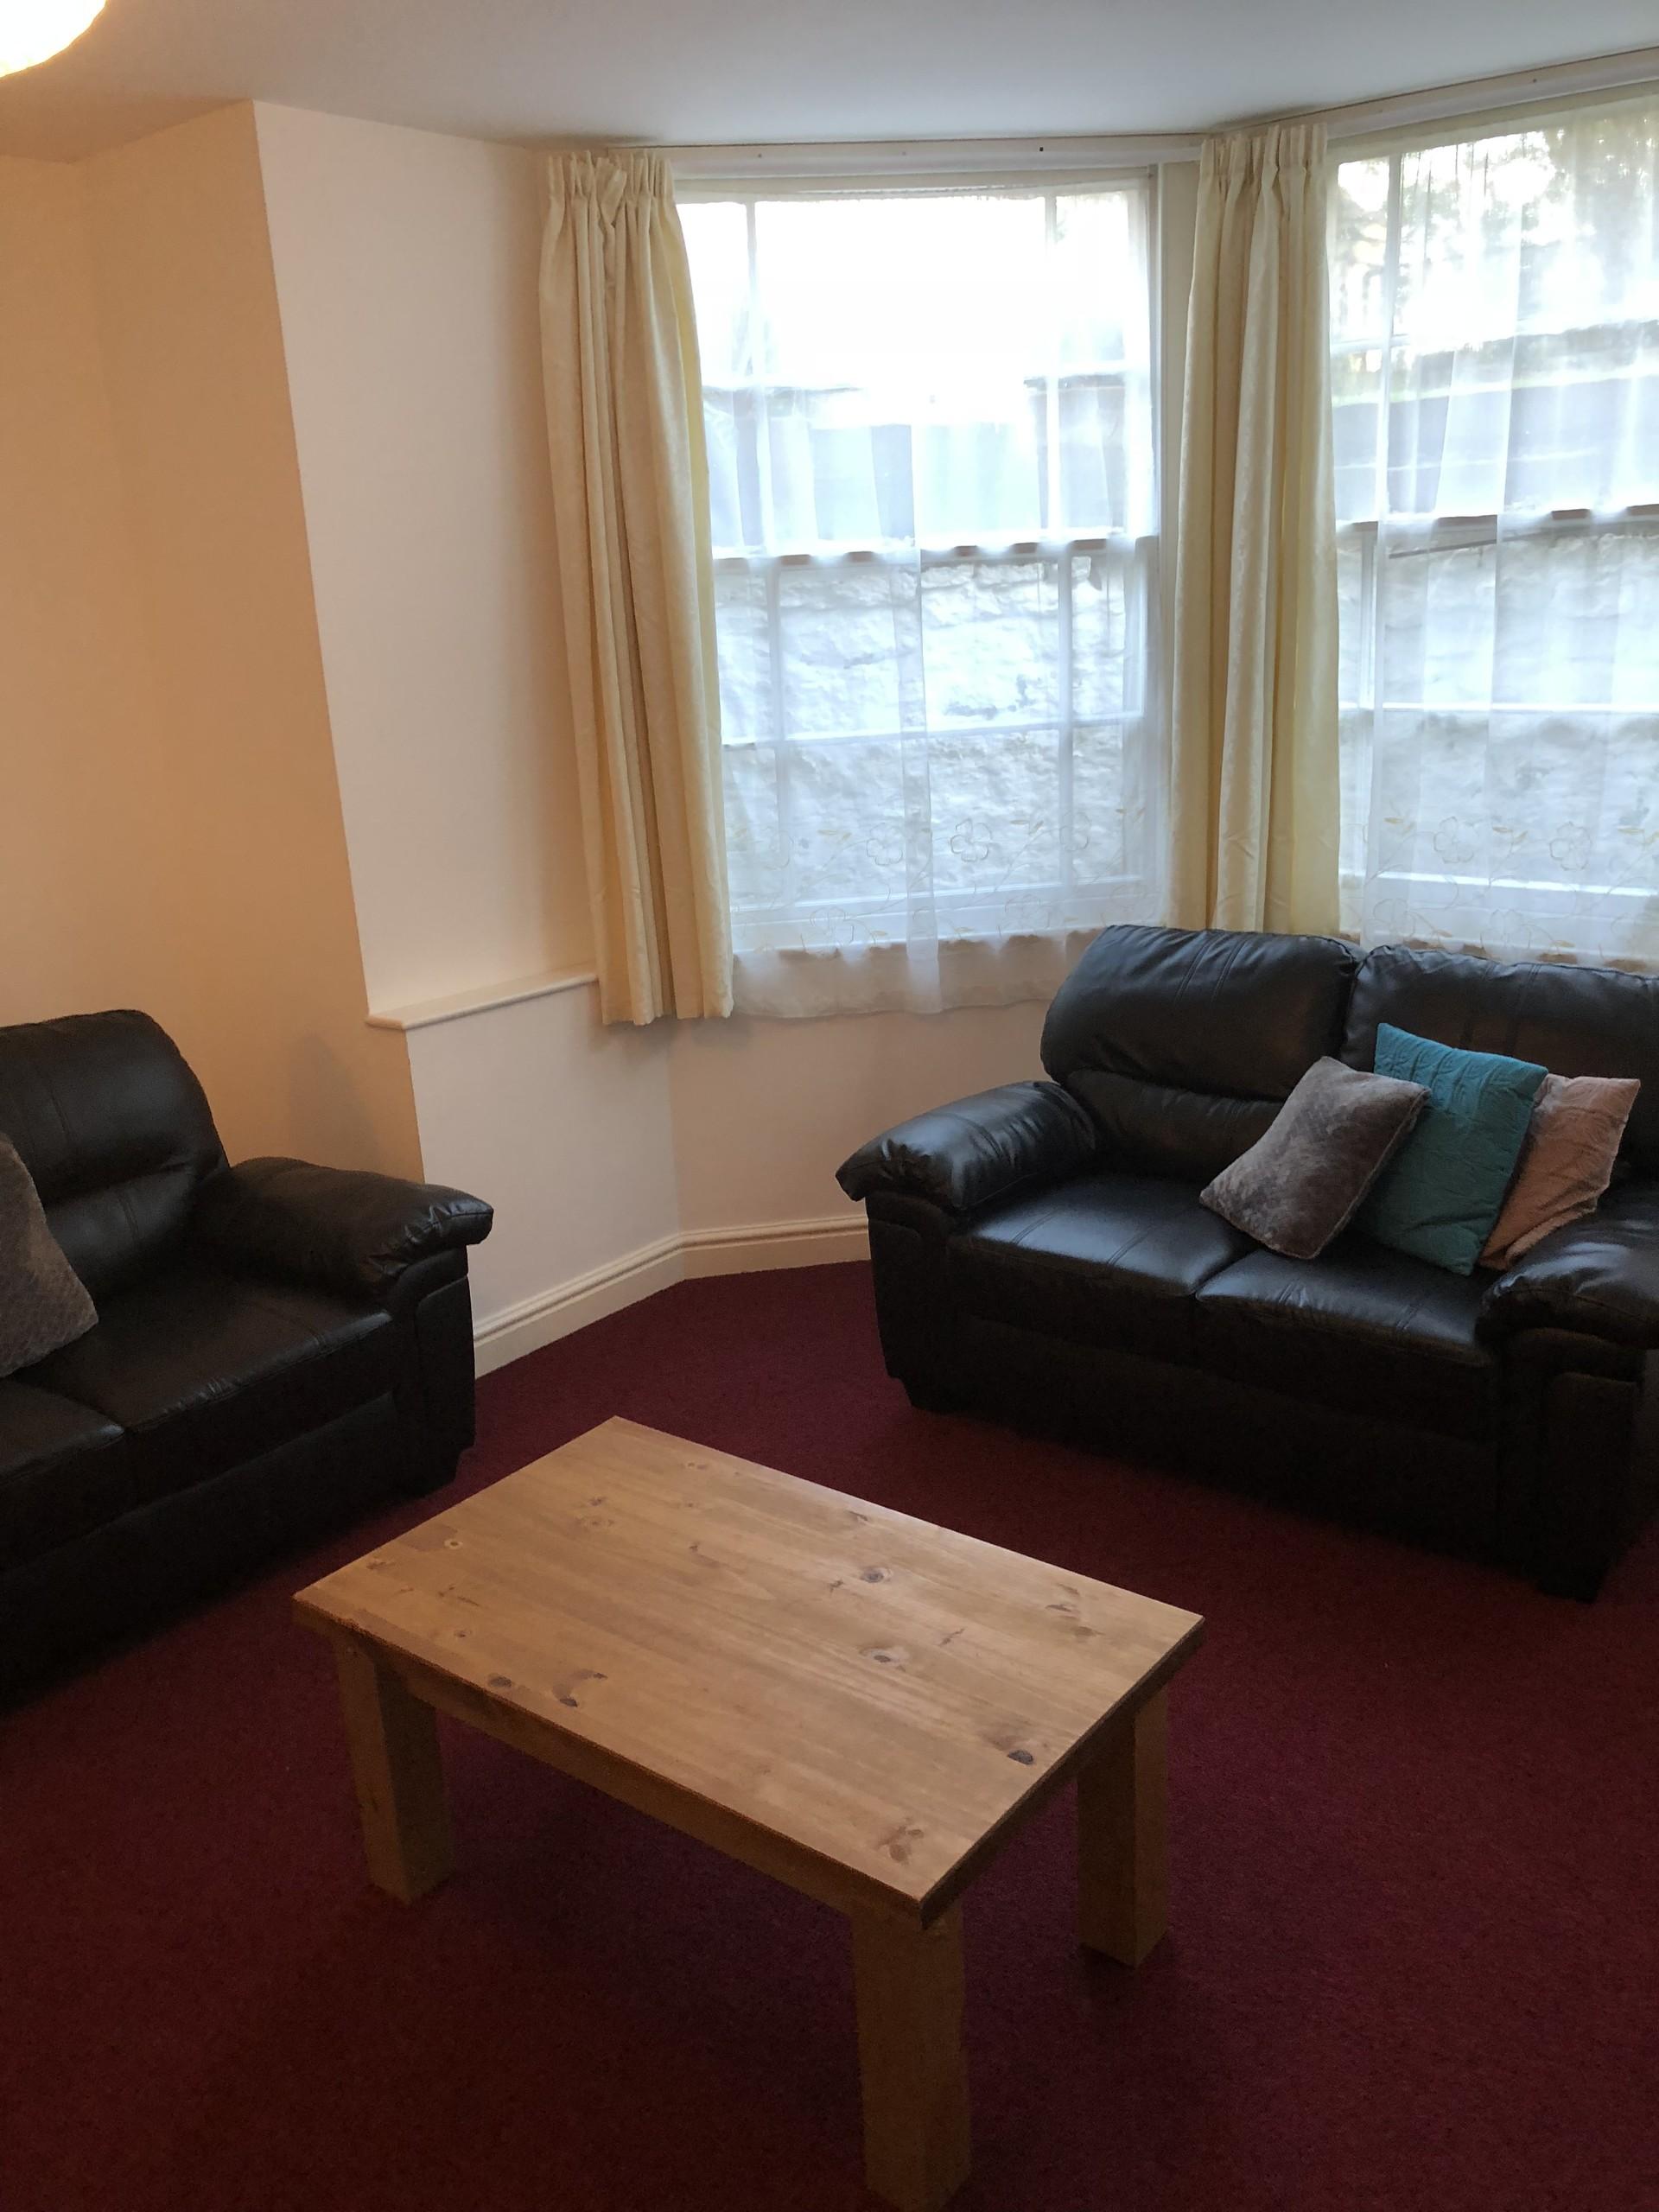 room-now-let-room-let-clifton-close-university-bristol-411ed0114a1978e9de23b8e049d919a6